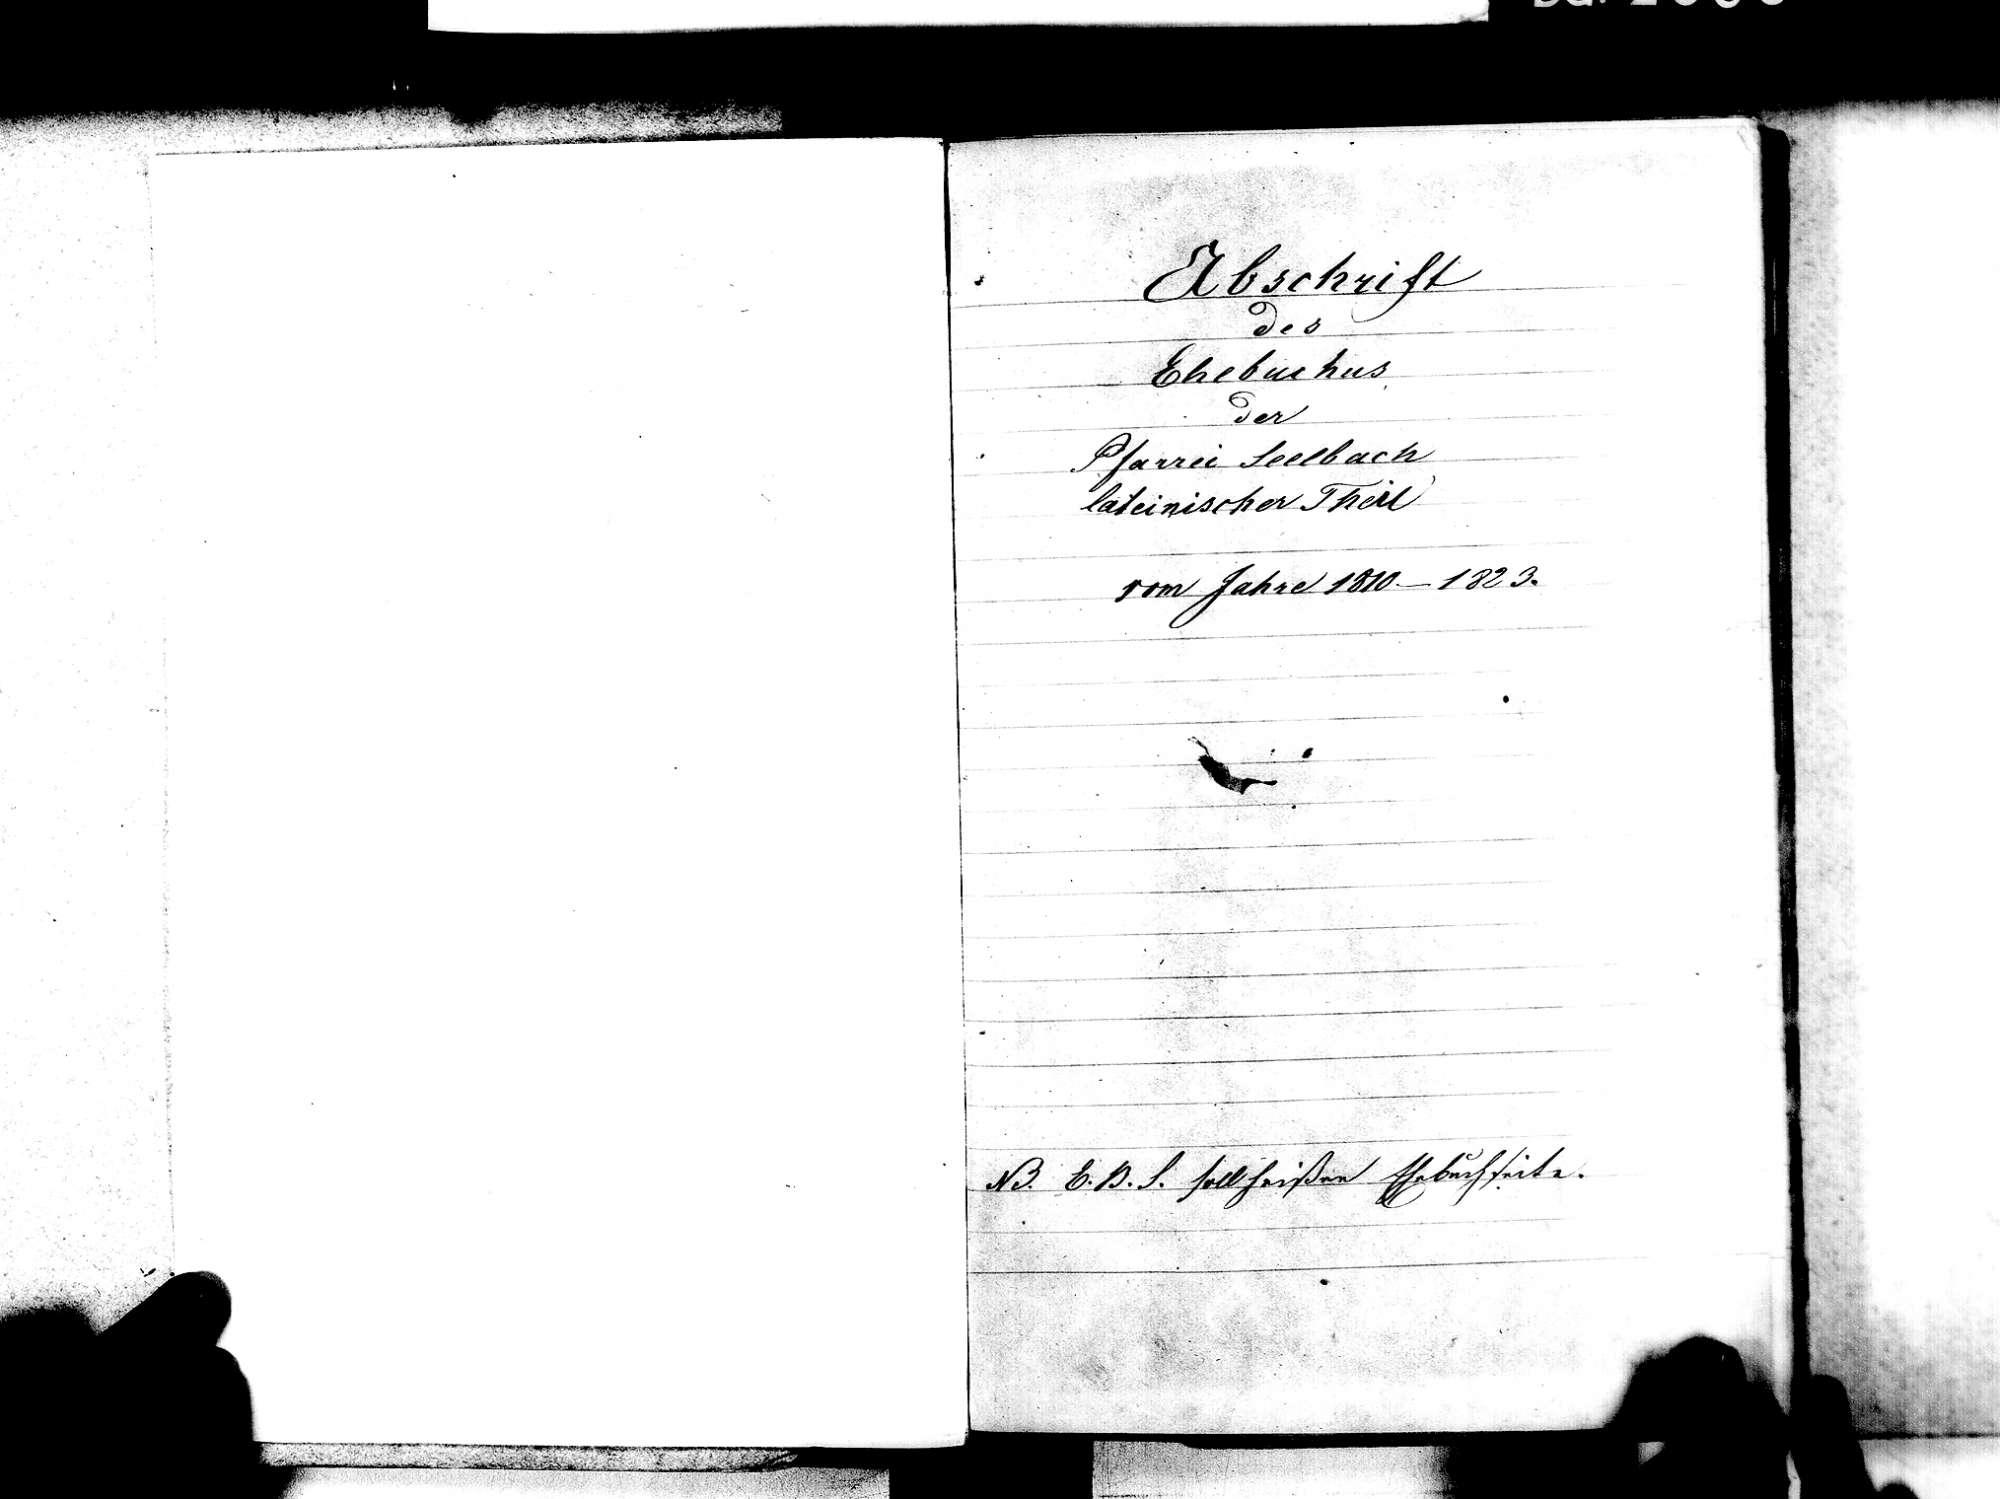 Seelbach OG; Katholische Gemeinde: Heiratsbuch 1810-1828, Bild 3